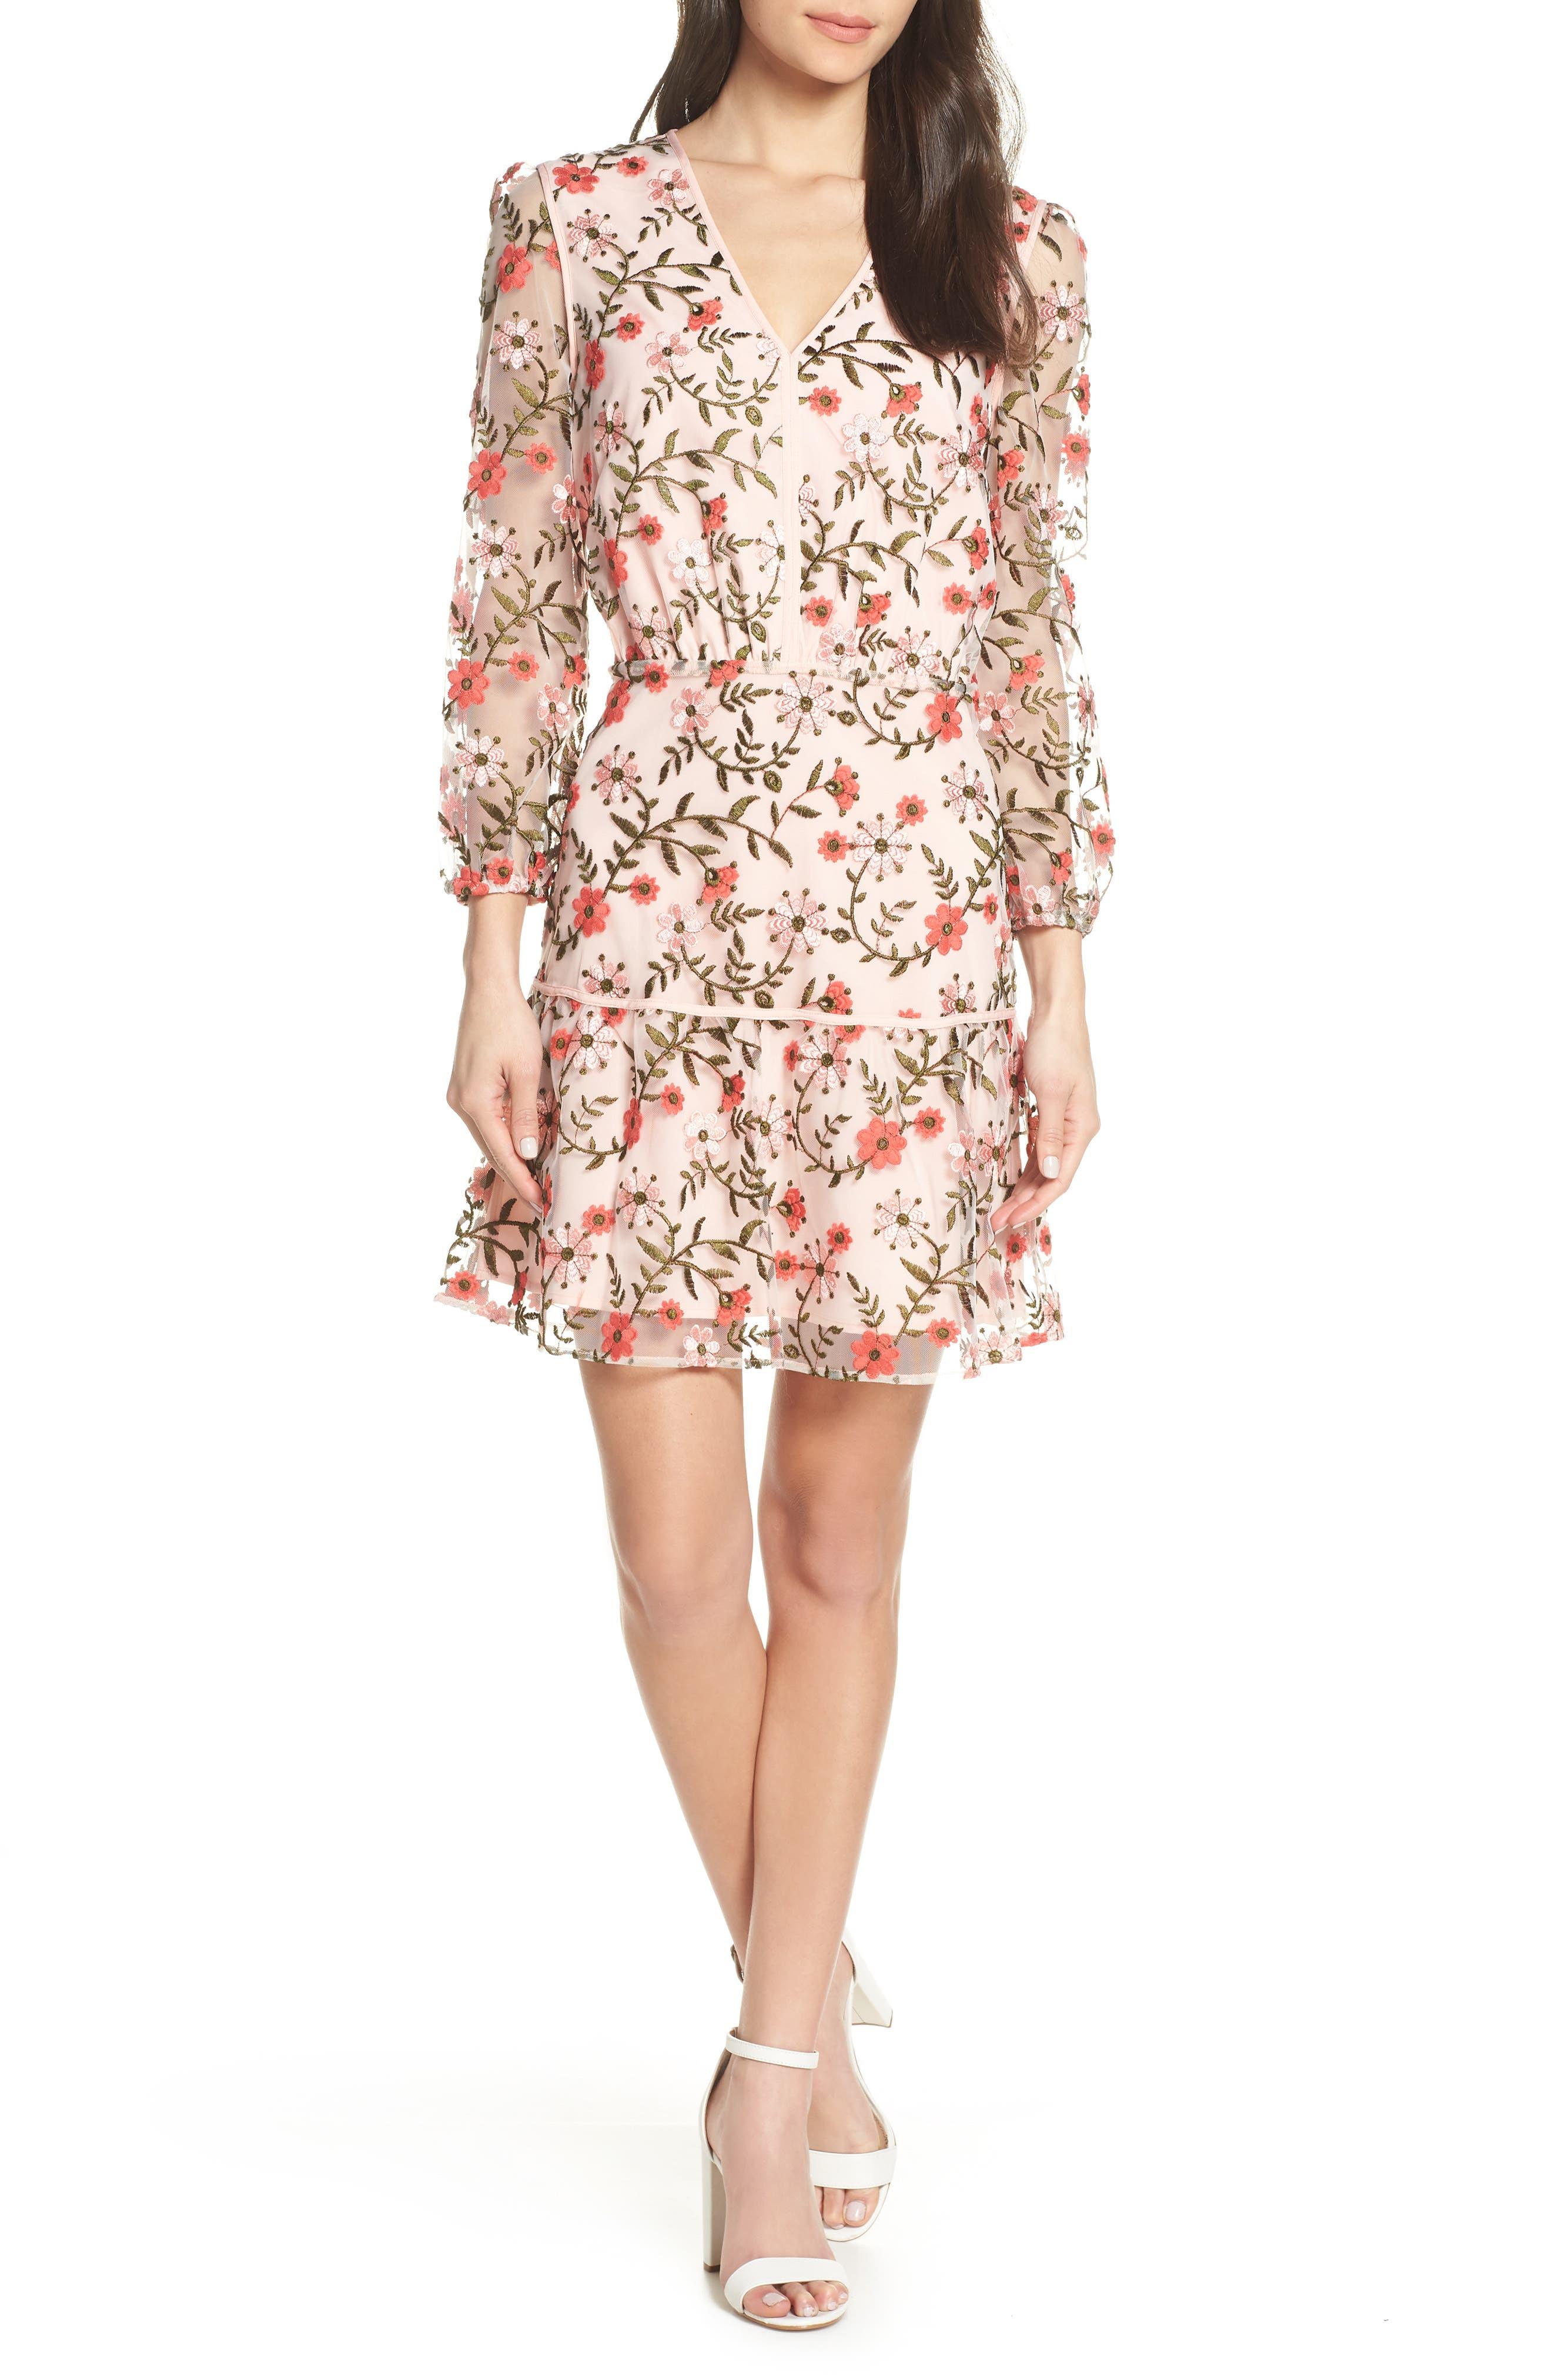 Sam Edelman Embroidered Floral Dress, Pink